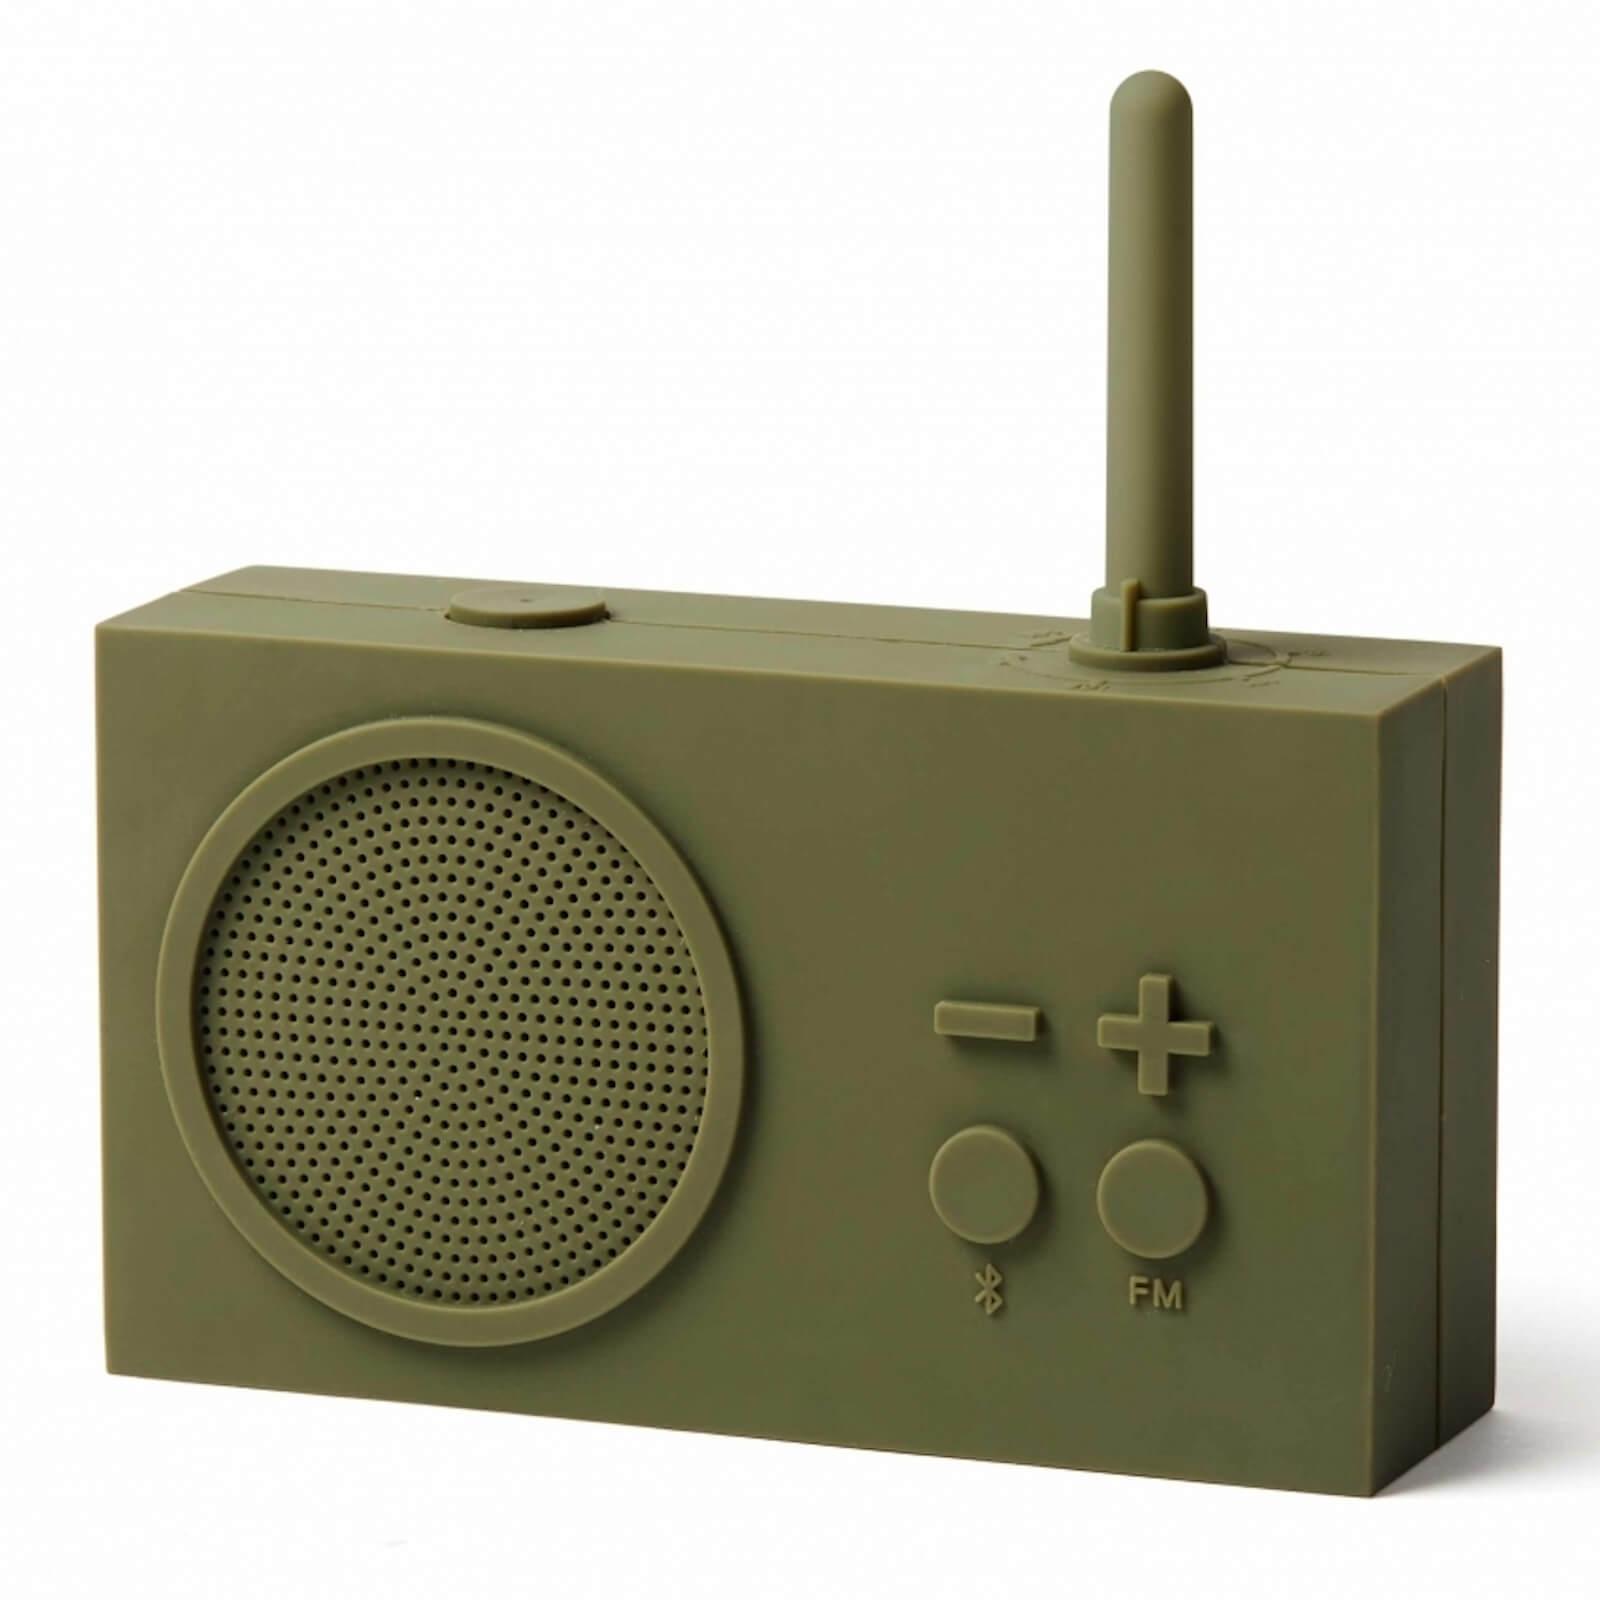 Lexon TYKHO 3 FM Radio and Bluetooth Speaker - Khaki